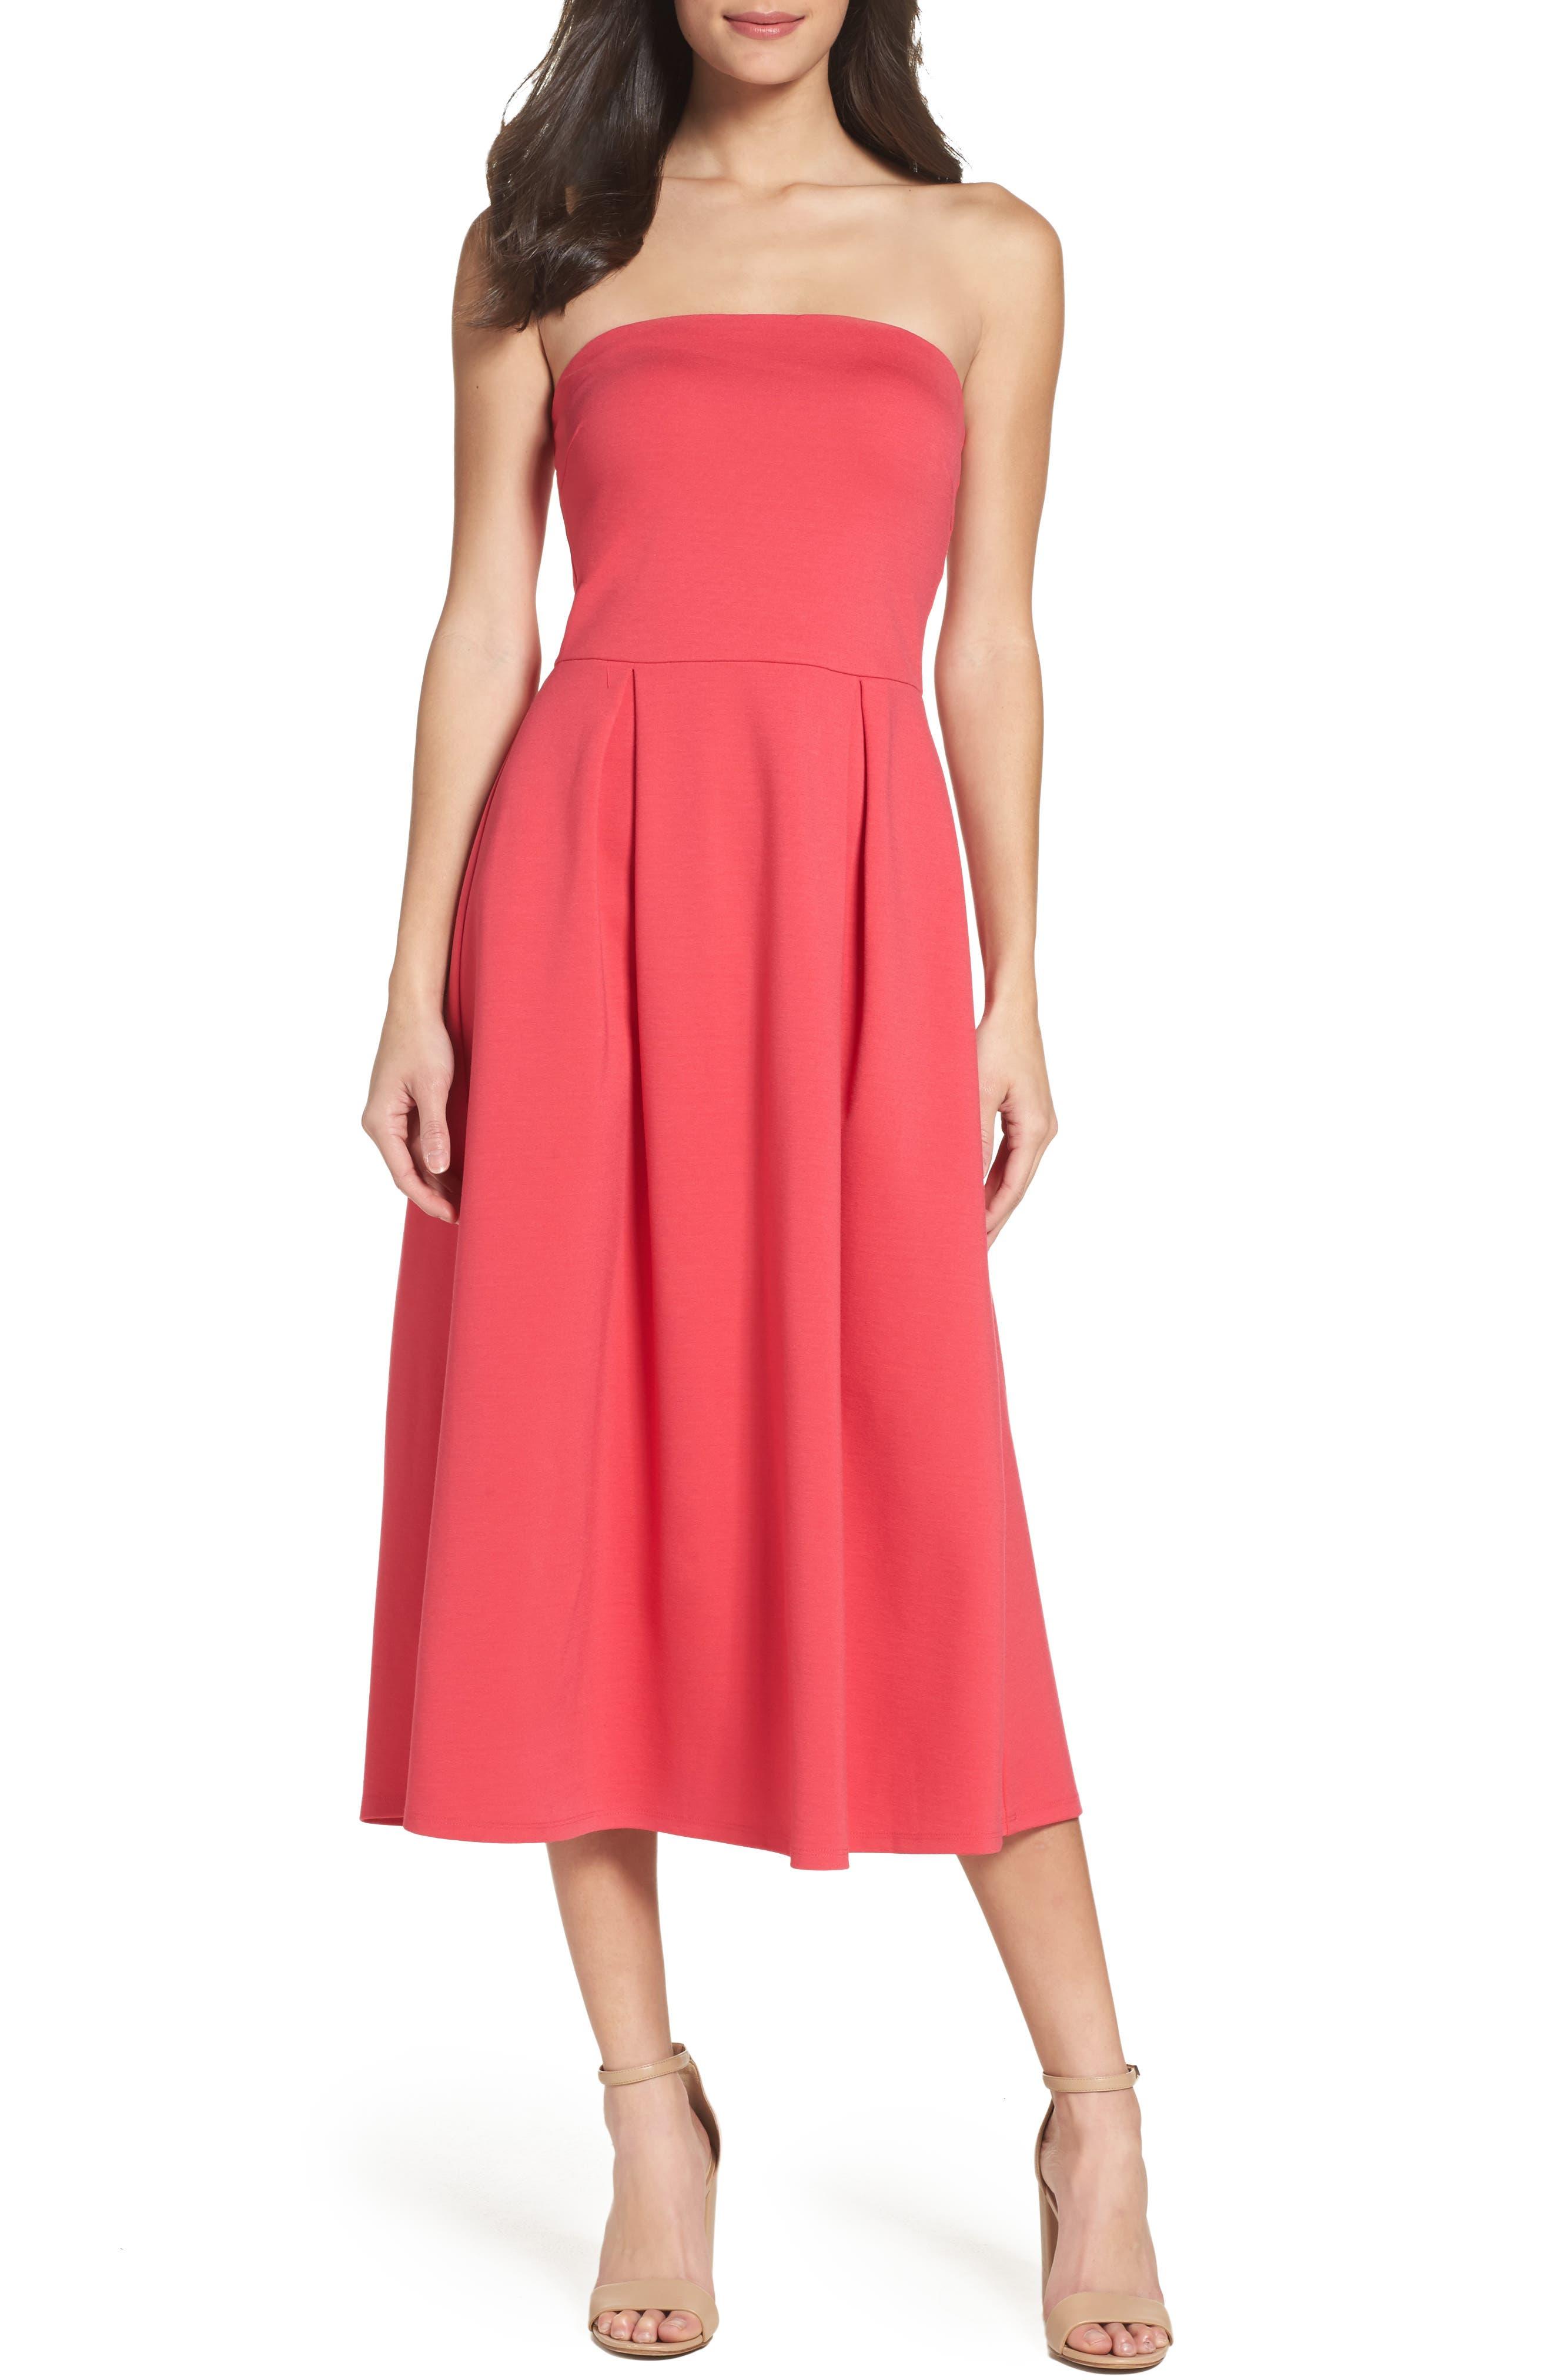 Main Image - Charles Henry Strapless Midi Dress